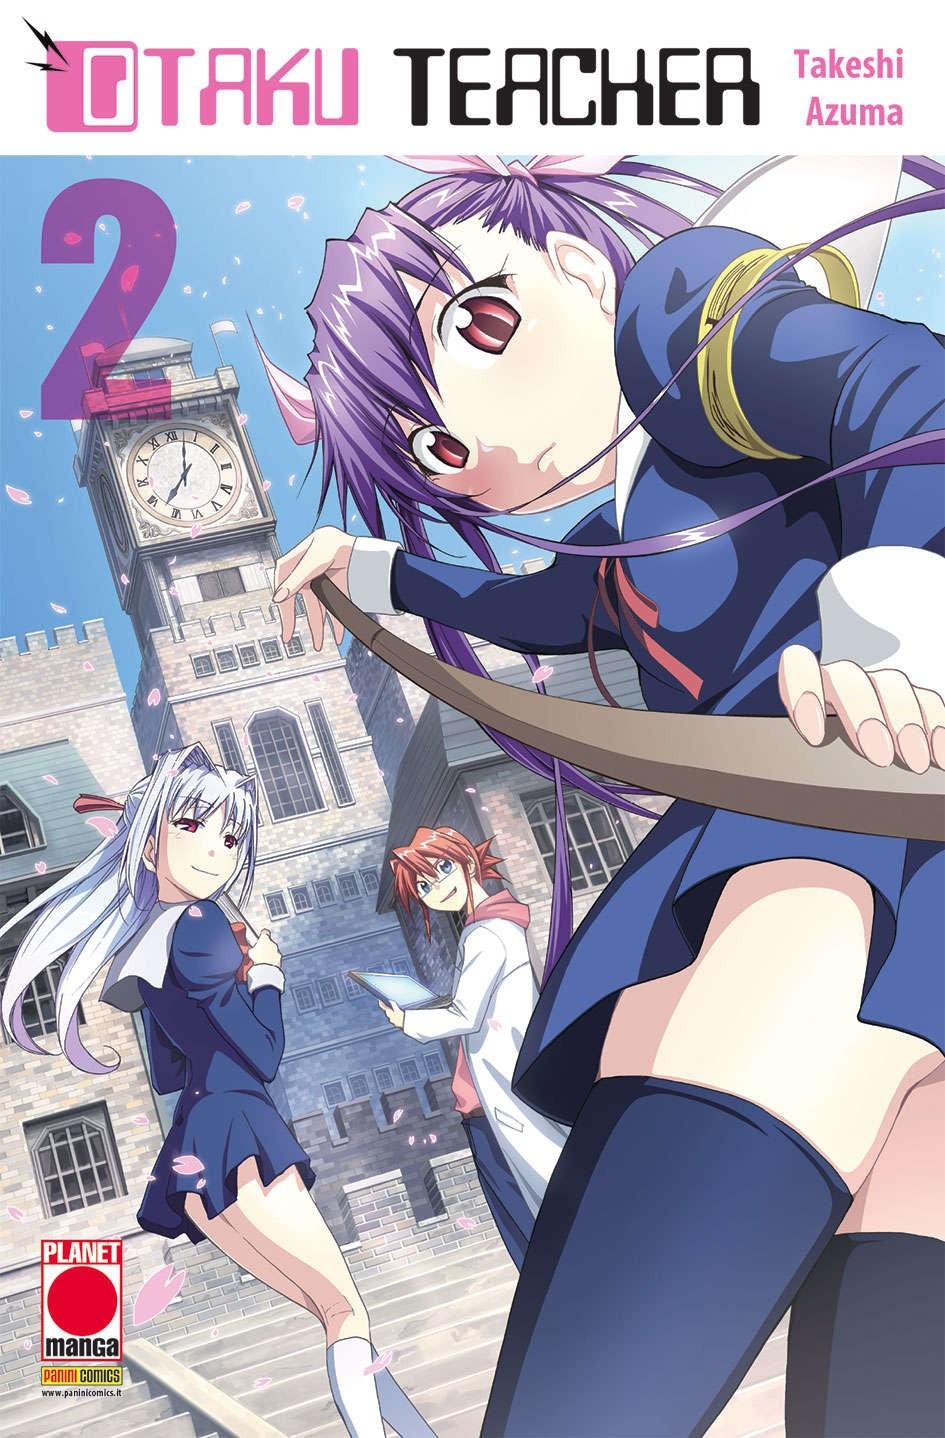 Otaku Teacher - N° 2 - Otaku Teacher - Sakura Planet Manga